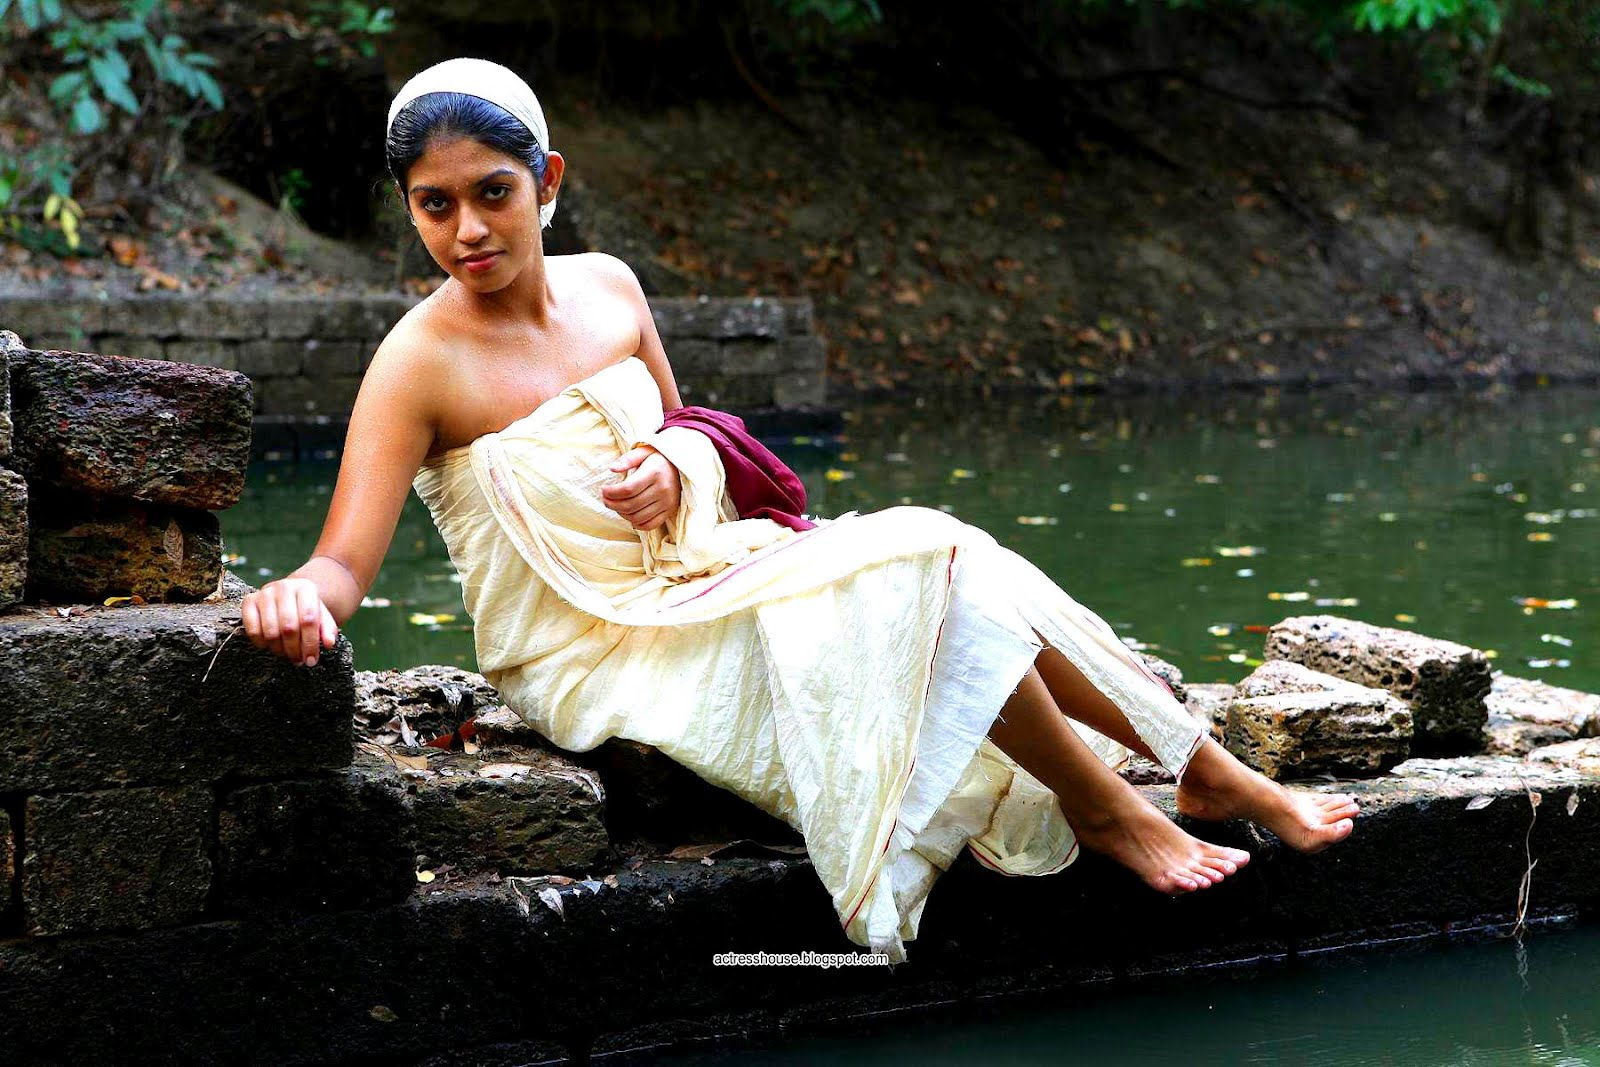 hd prorn malayalam film hot video